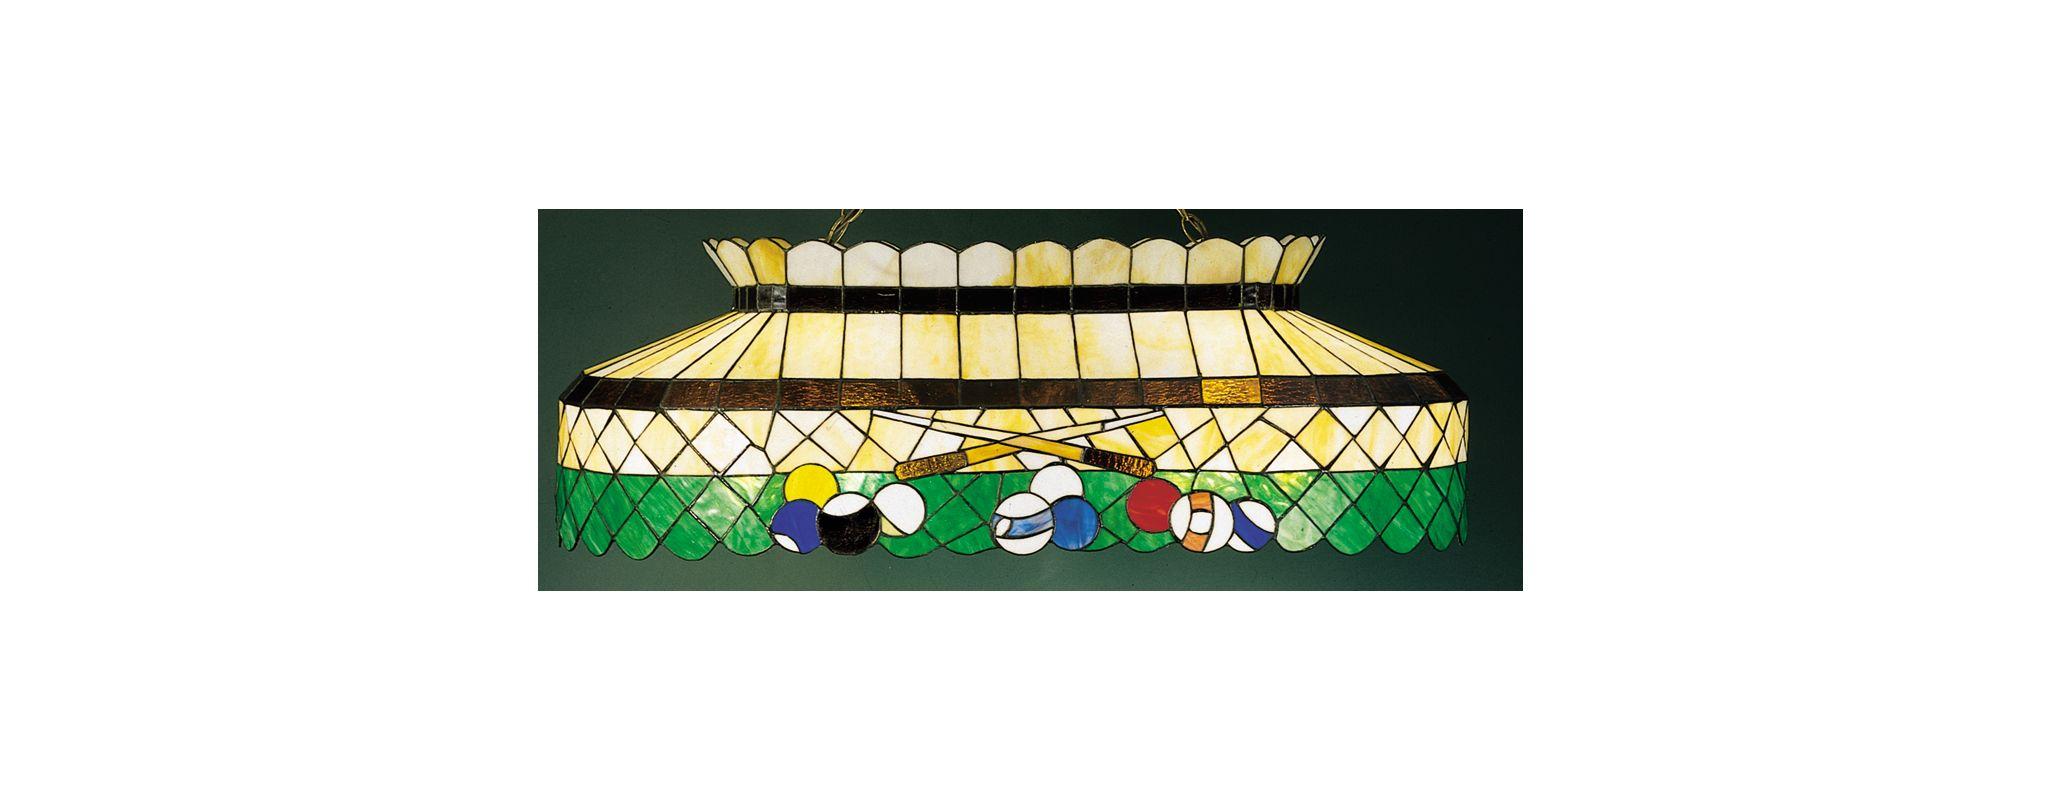 Meyda Tiffany 28499 Stained Glass / Tiffany Island / Billiard Fixture